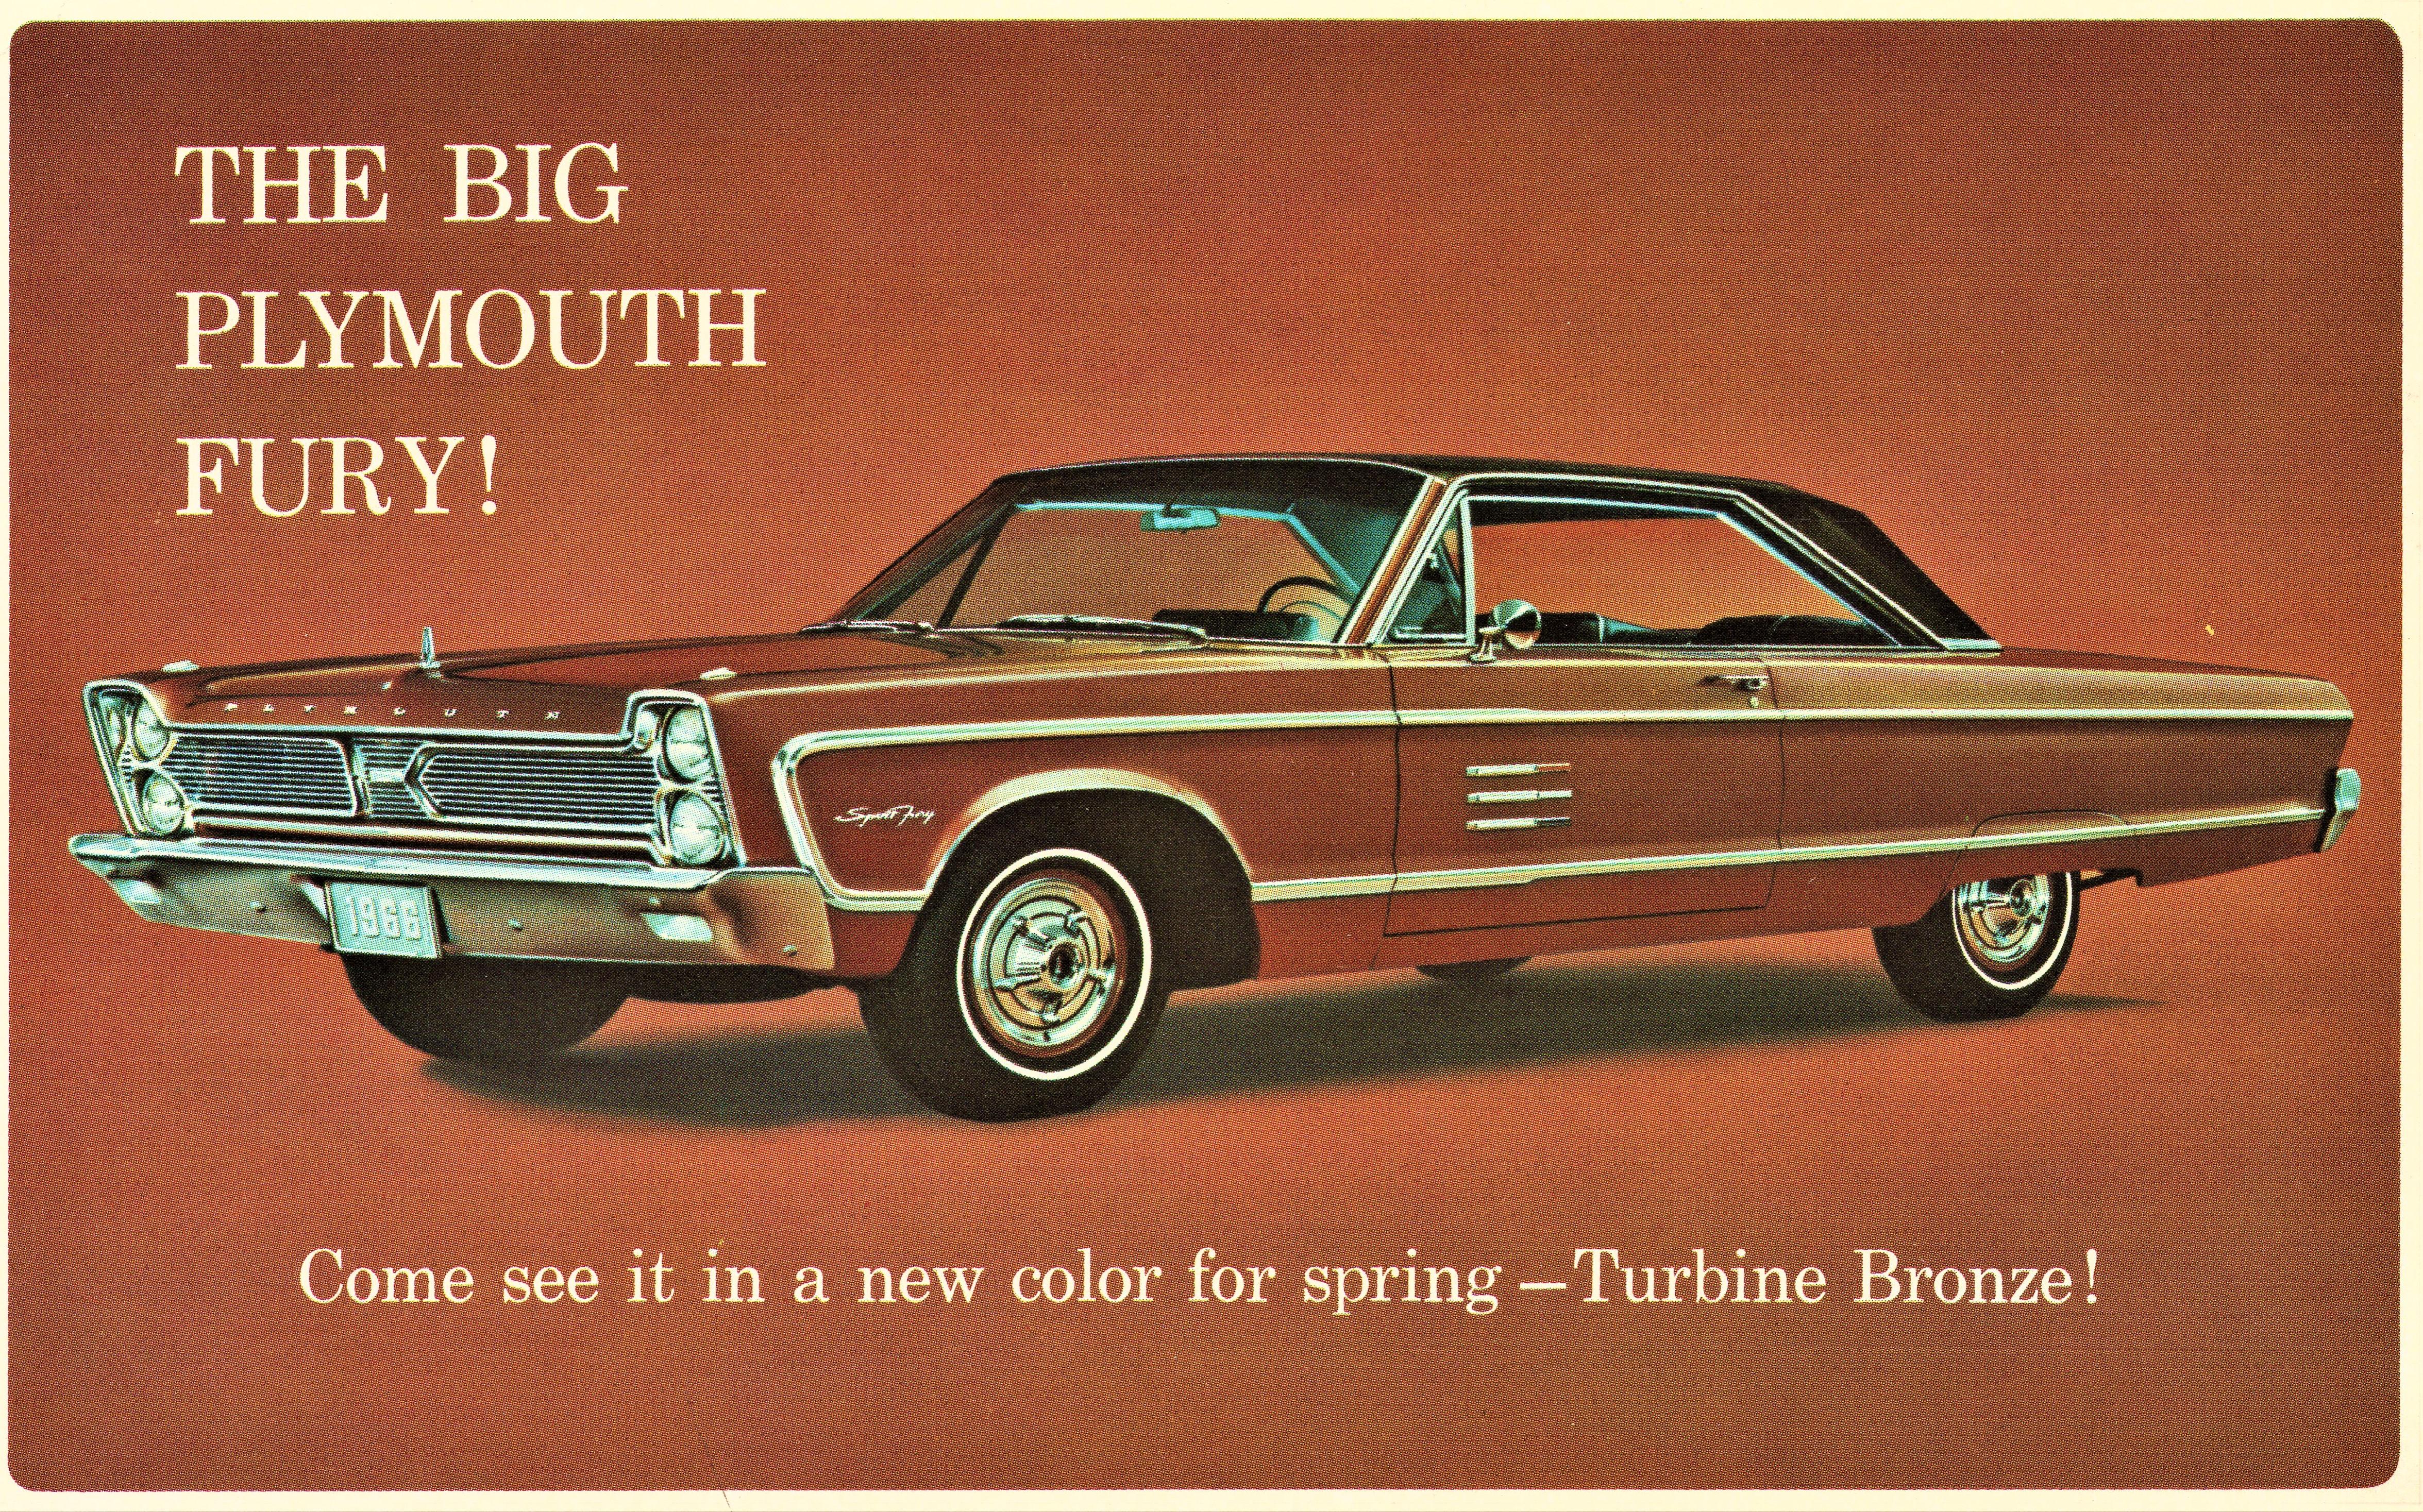 1966 Plymouth Sport Fury 2-Door Hardtop postcard